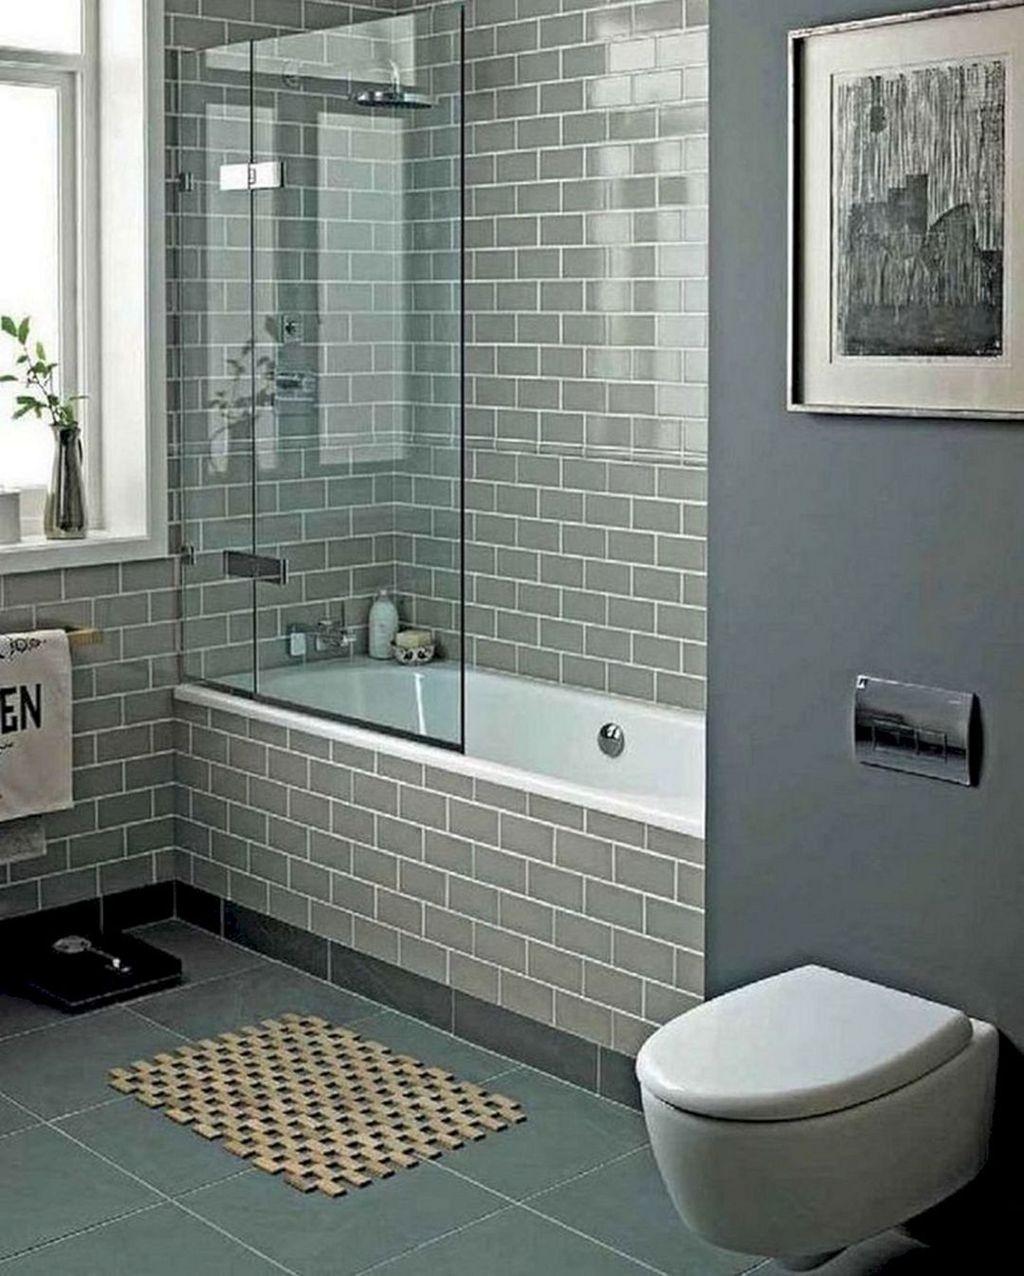 Inspiring Bathroom Tile Ideas 12